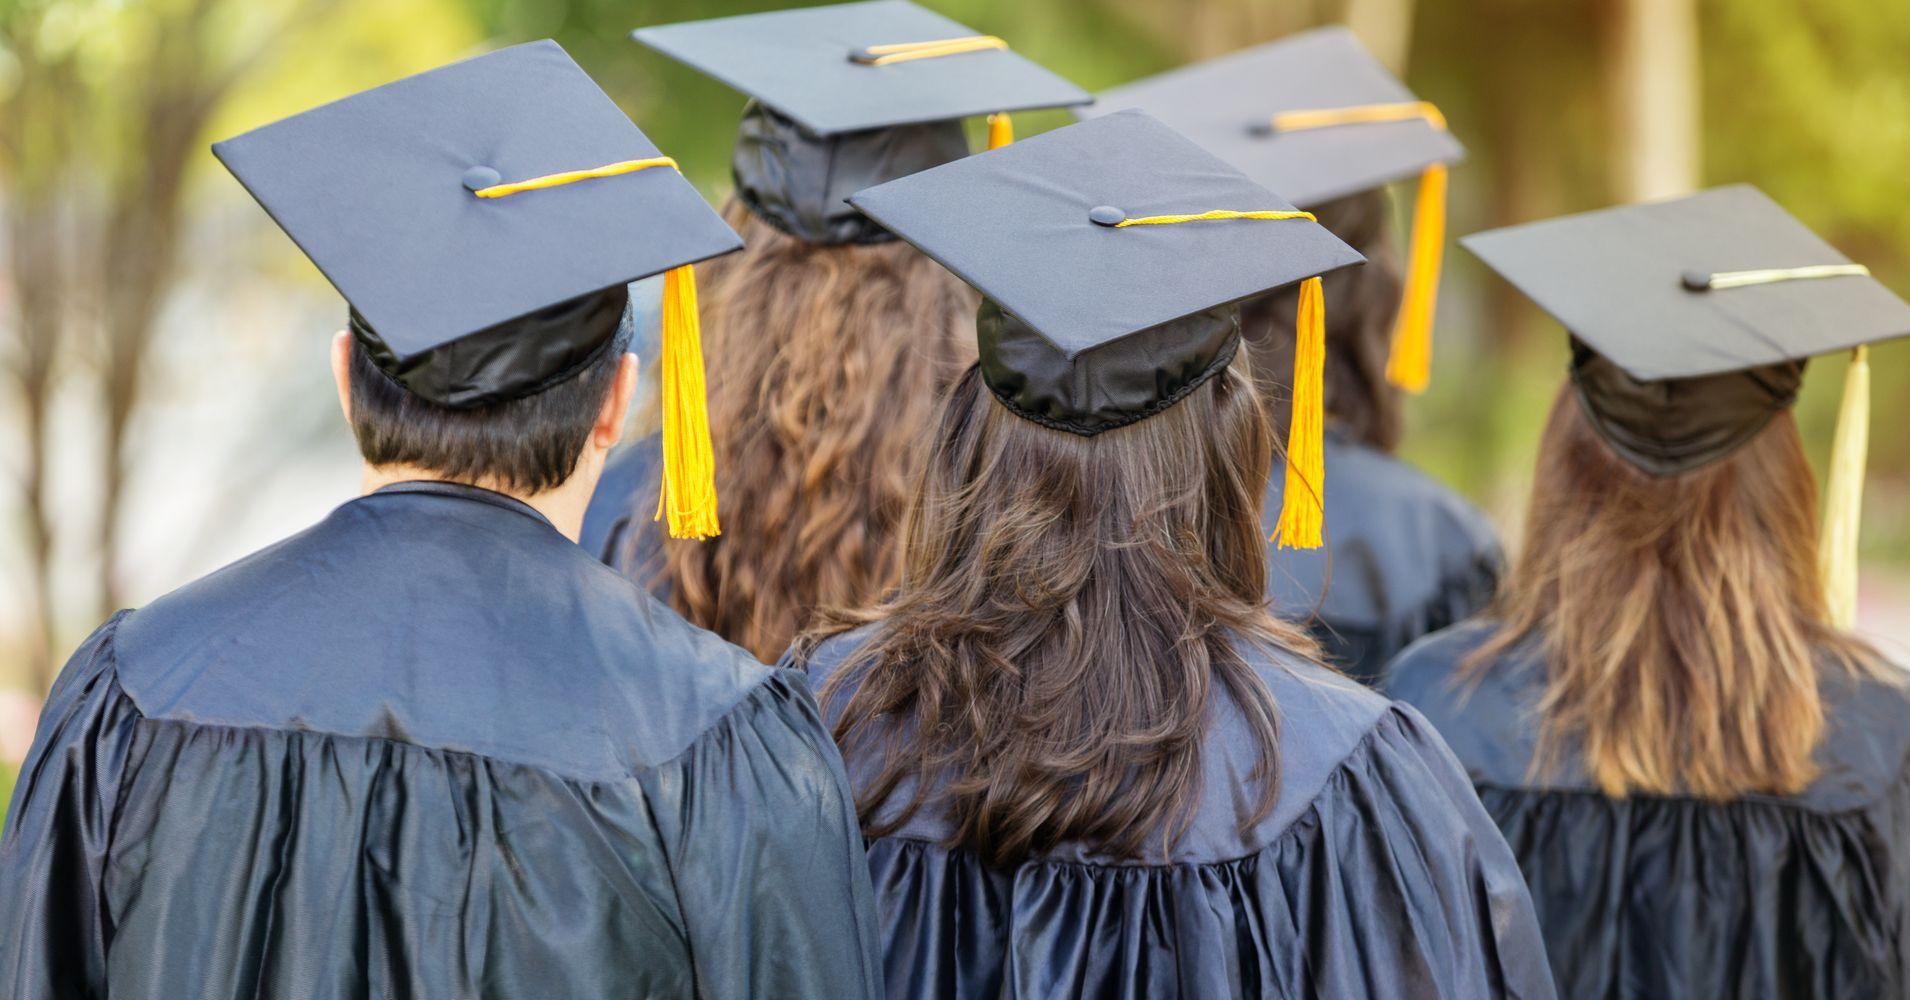 College Graduation | HuffPost